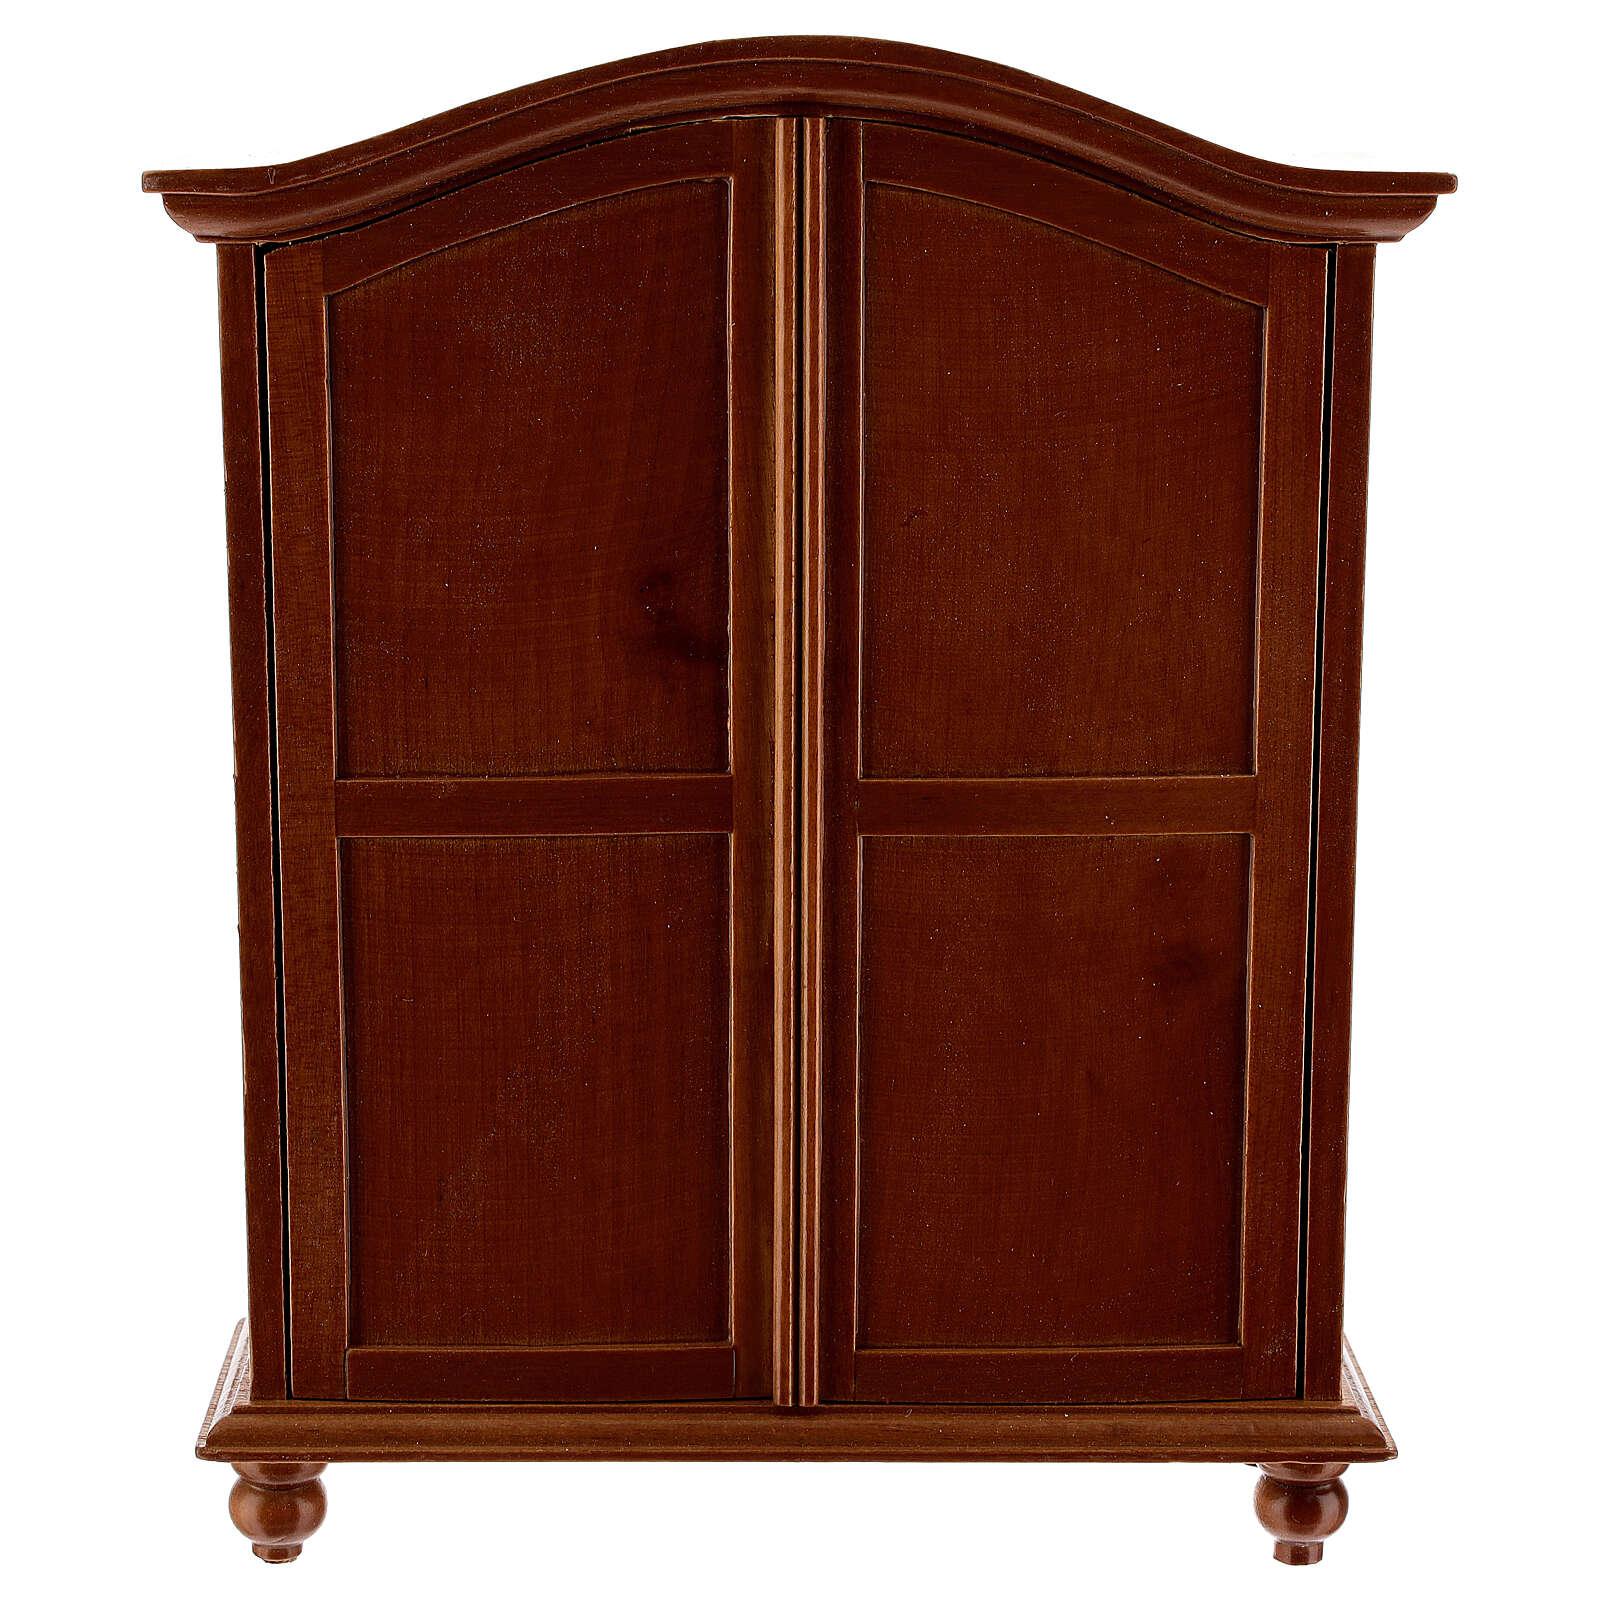 Wooden closet classic style 20x15x5 cm Nativity scene 12-14 cm 4